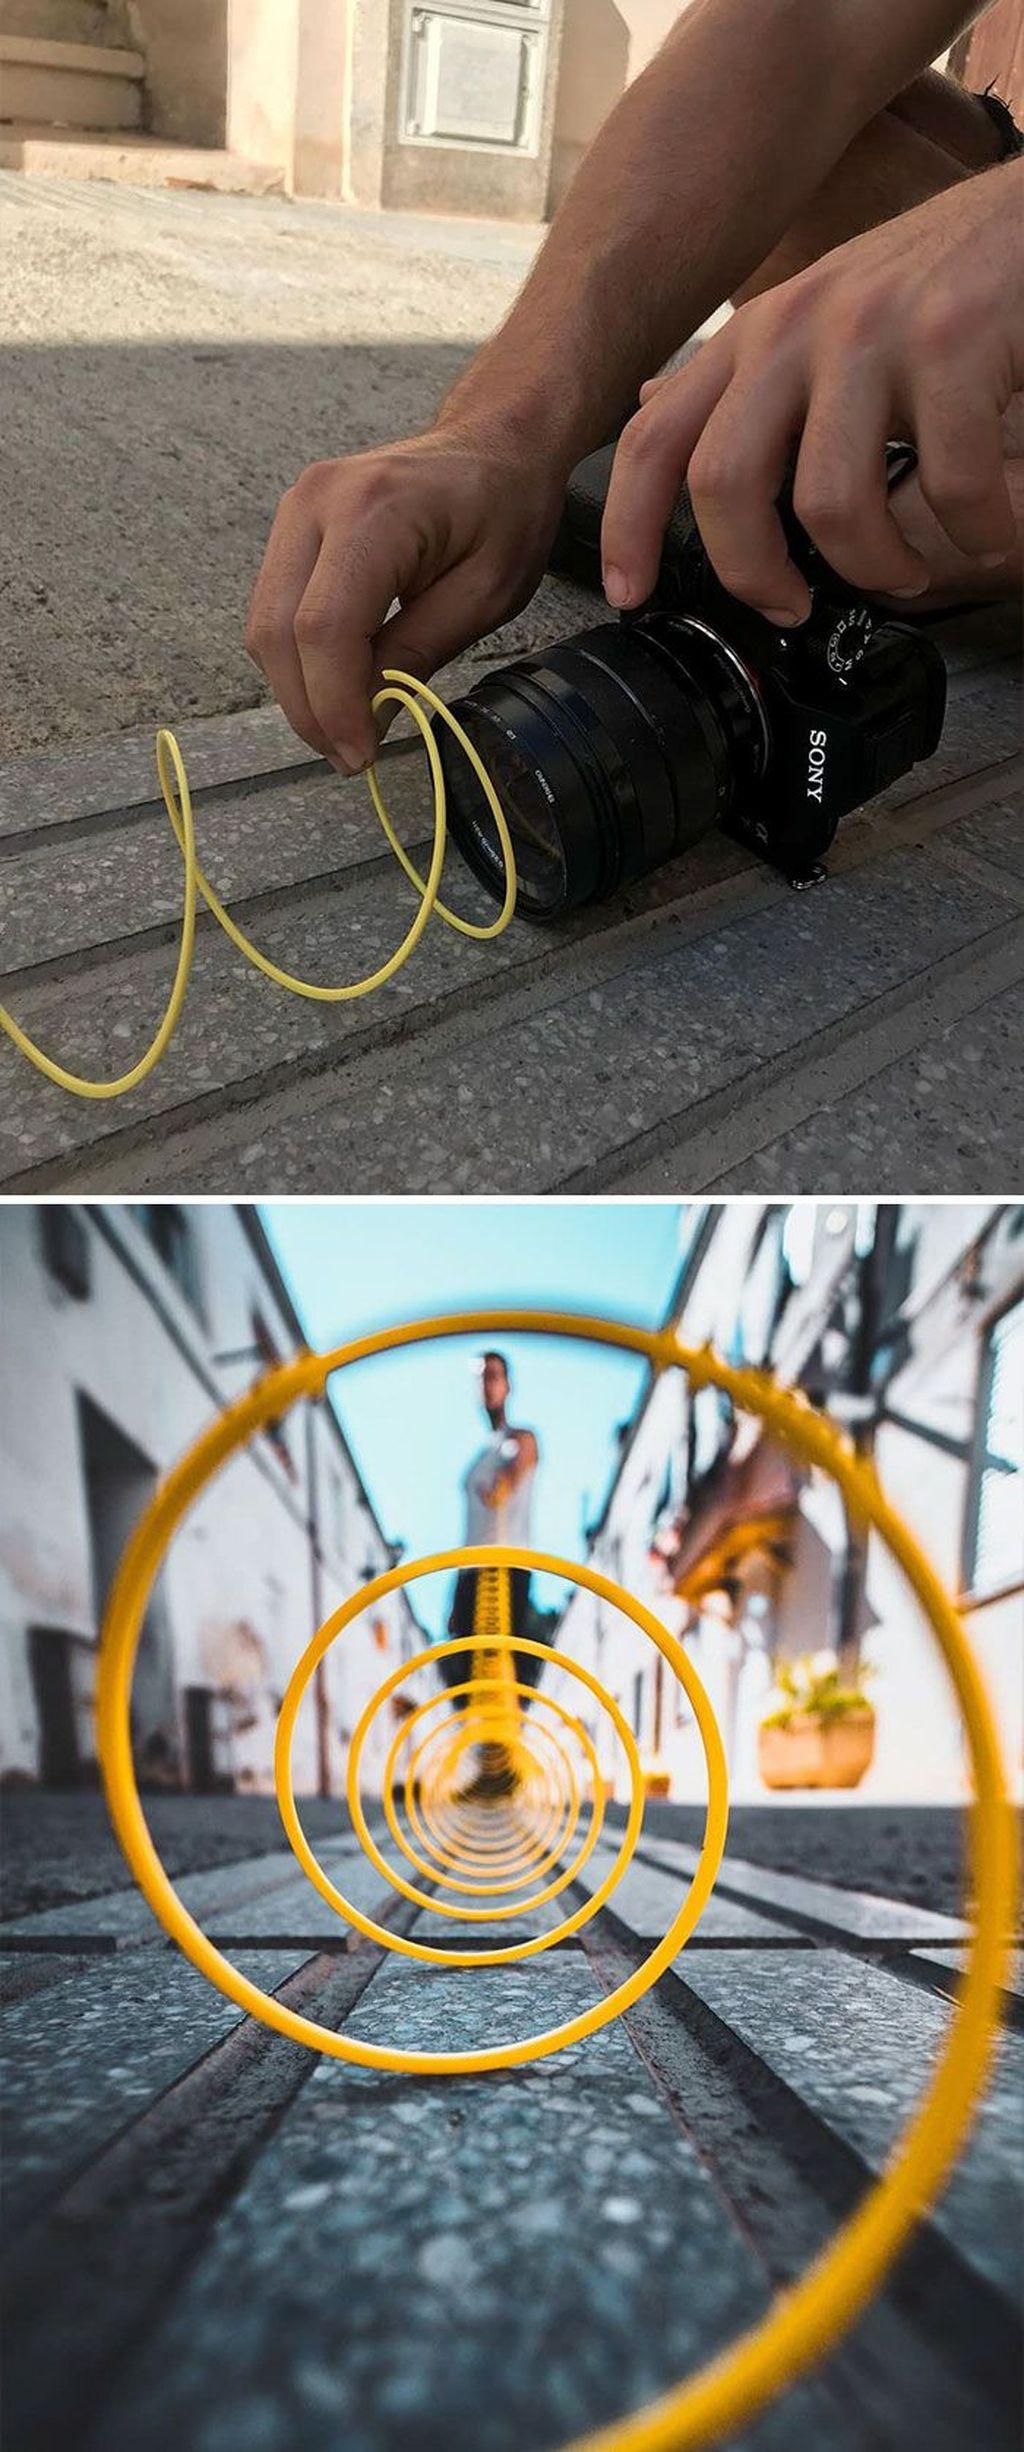 Memanfaatkan tali spiral. Foto: instagram.com/jordi.koalitic